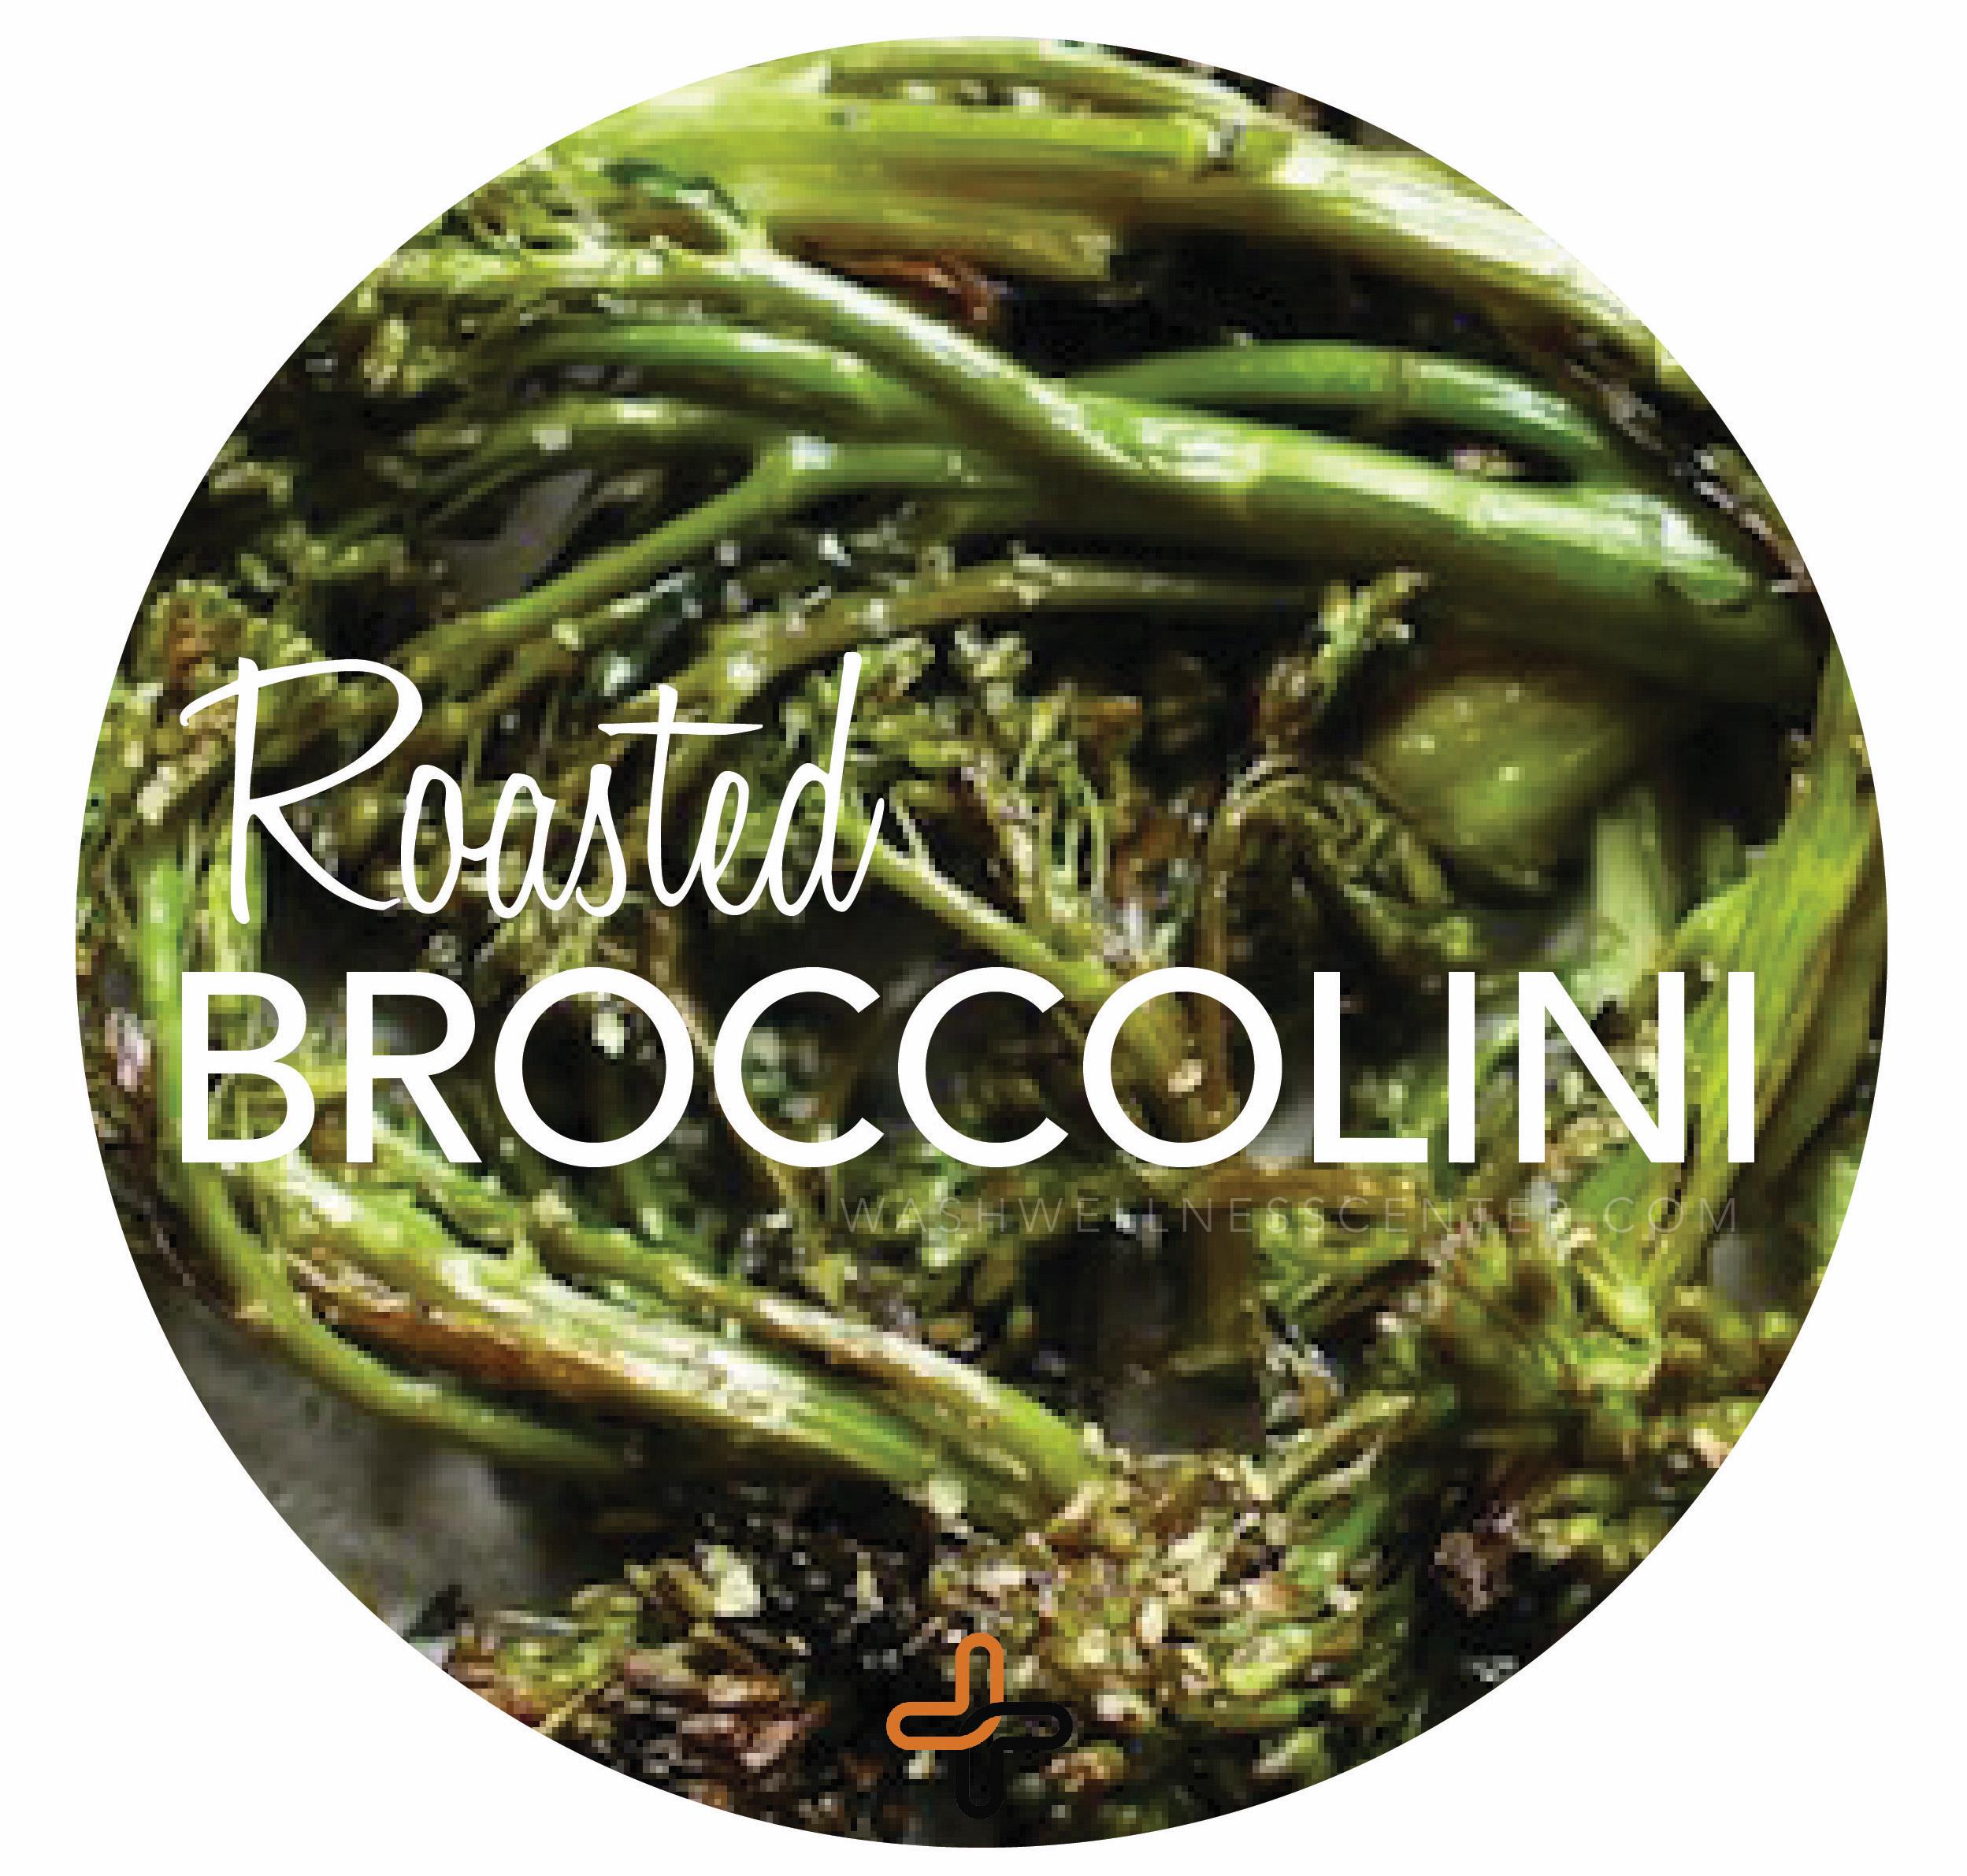 Roasted+Broccolini+Recipe.jpg